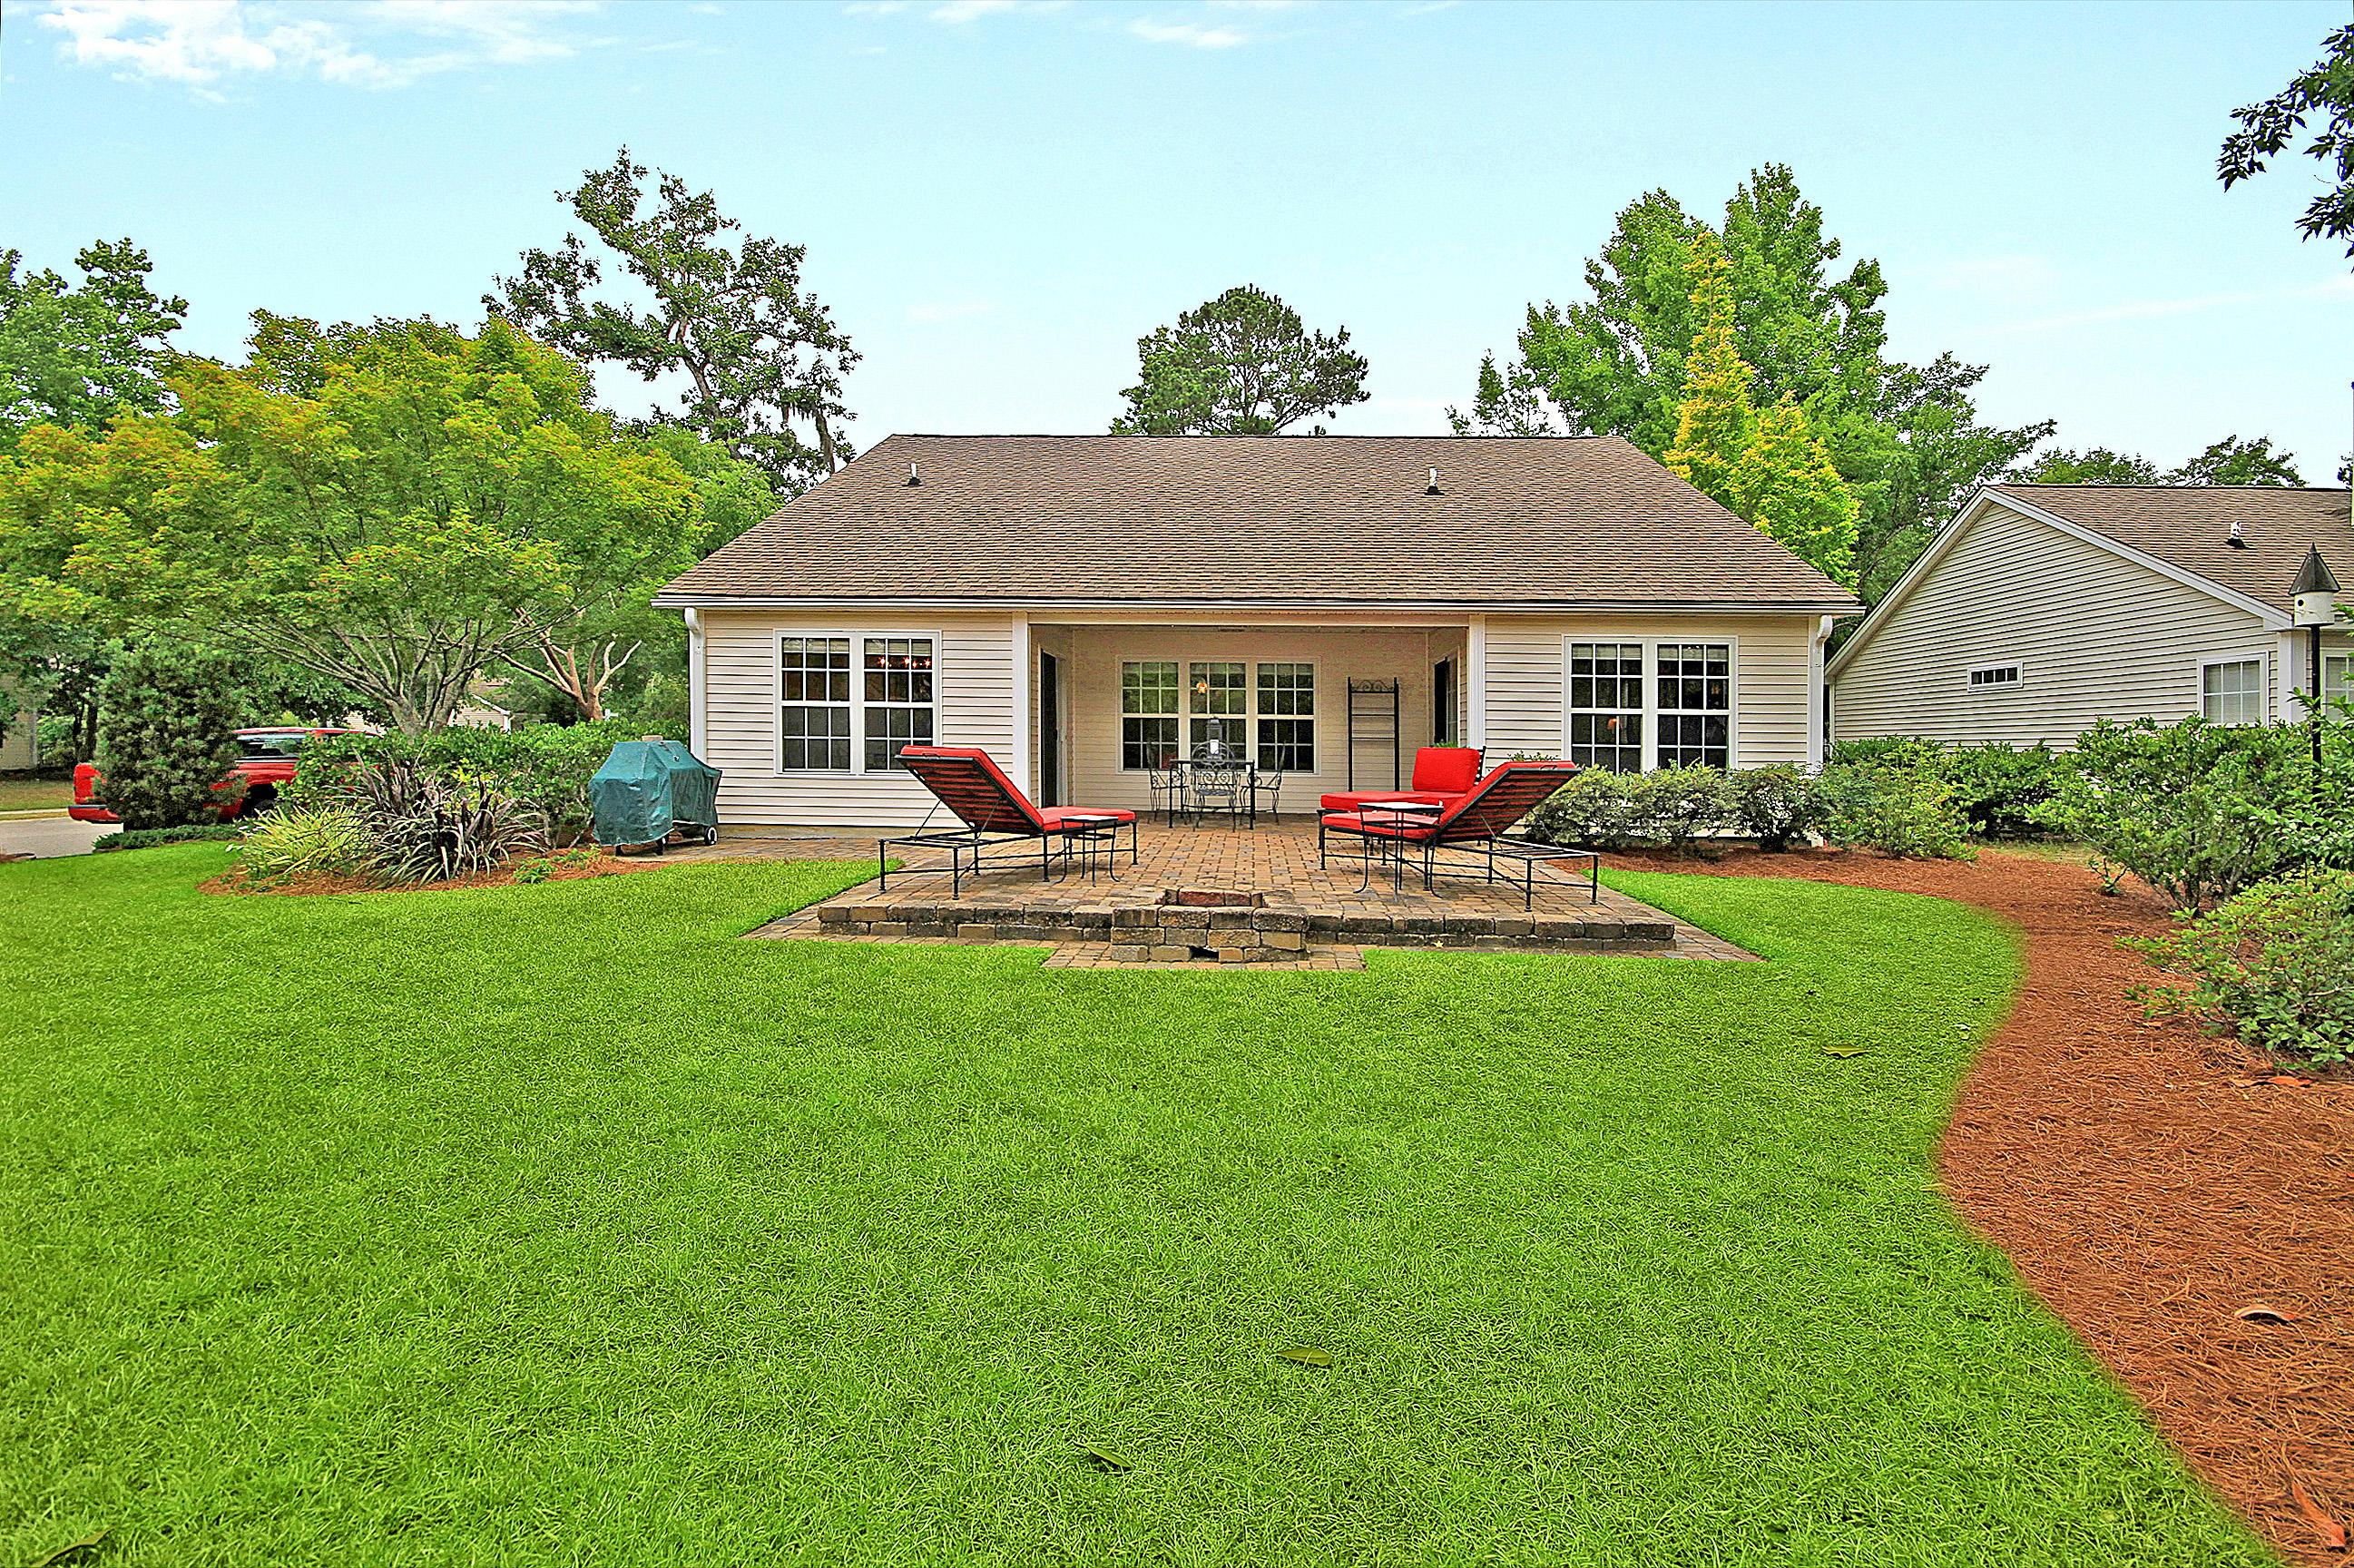 Planters Pointe Homes For Sale - 2863 Curran, Mount Pleasant, SC - 13